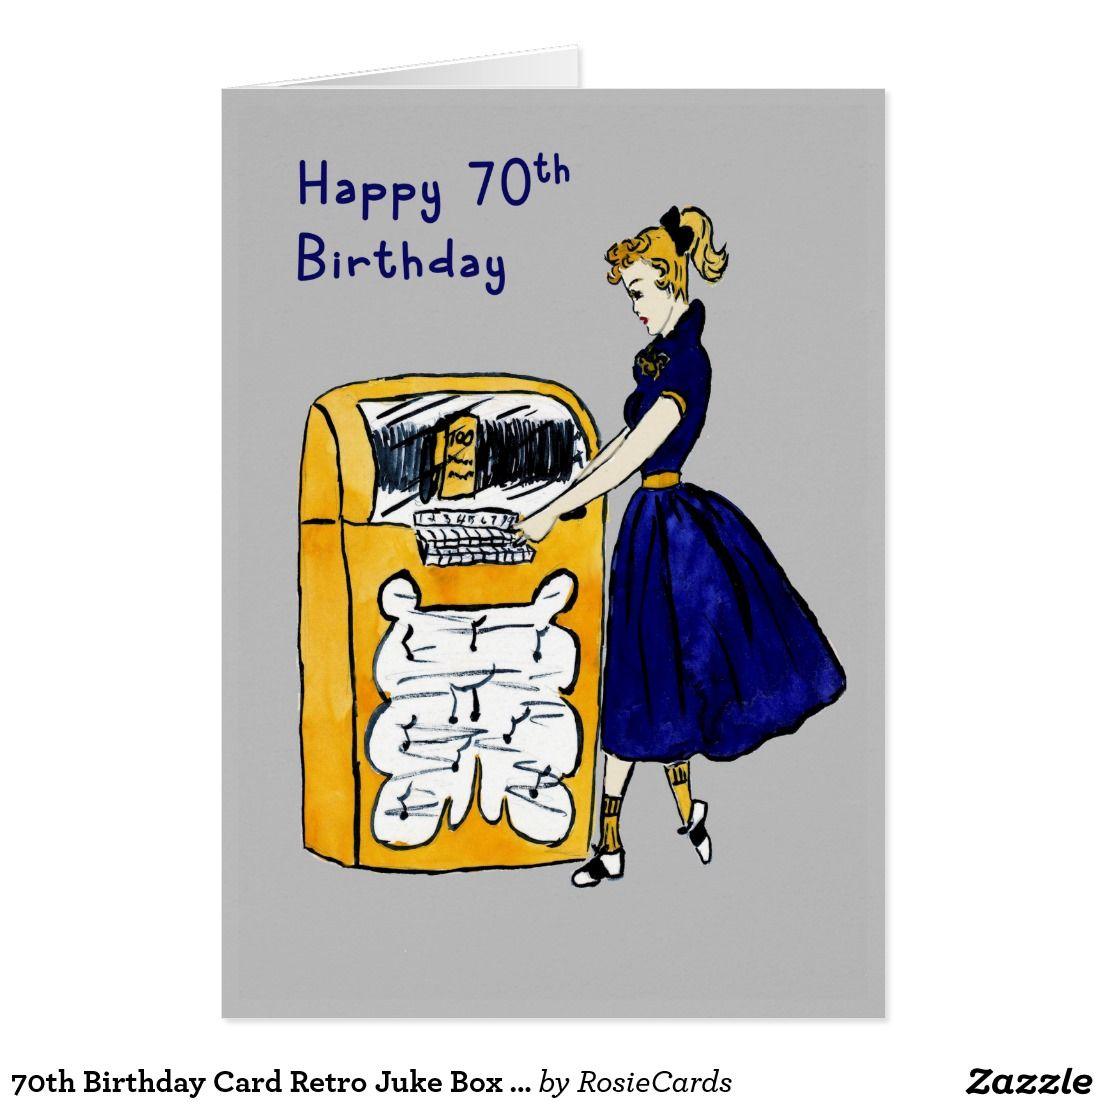 70th Birthday Card Retro Juke Box Lady Rosie Cards Birthday